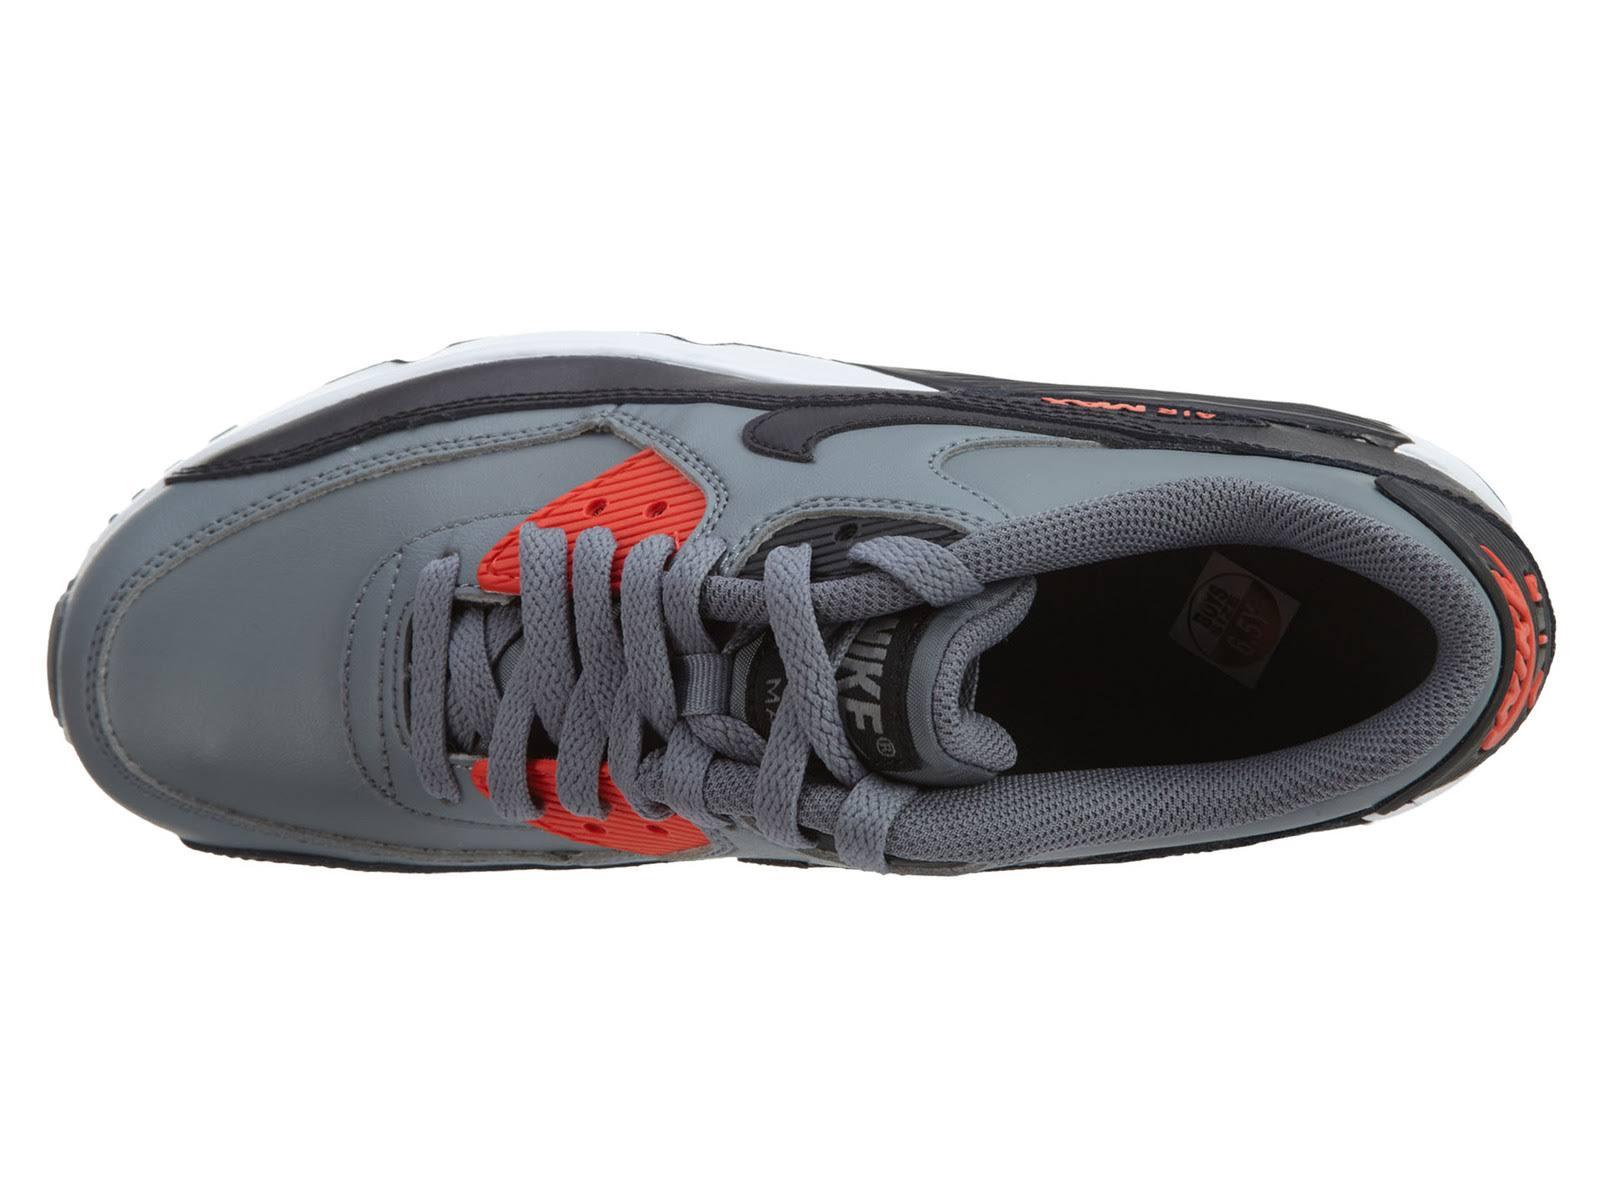 Nike Cool Orange 833412 010 Kinderschuhe gs Max 90 Schwarz Ltr Air Grau Mädchen Große rgw70qvnrC